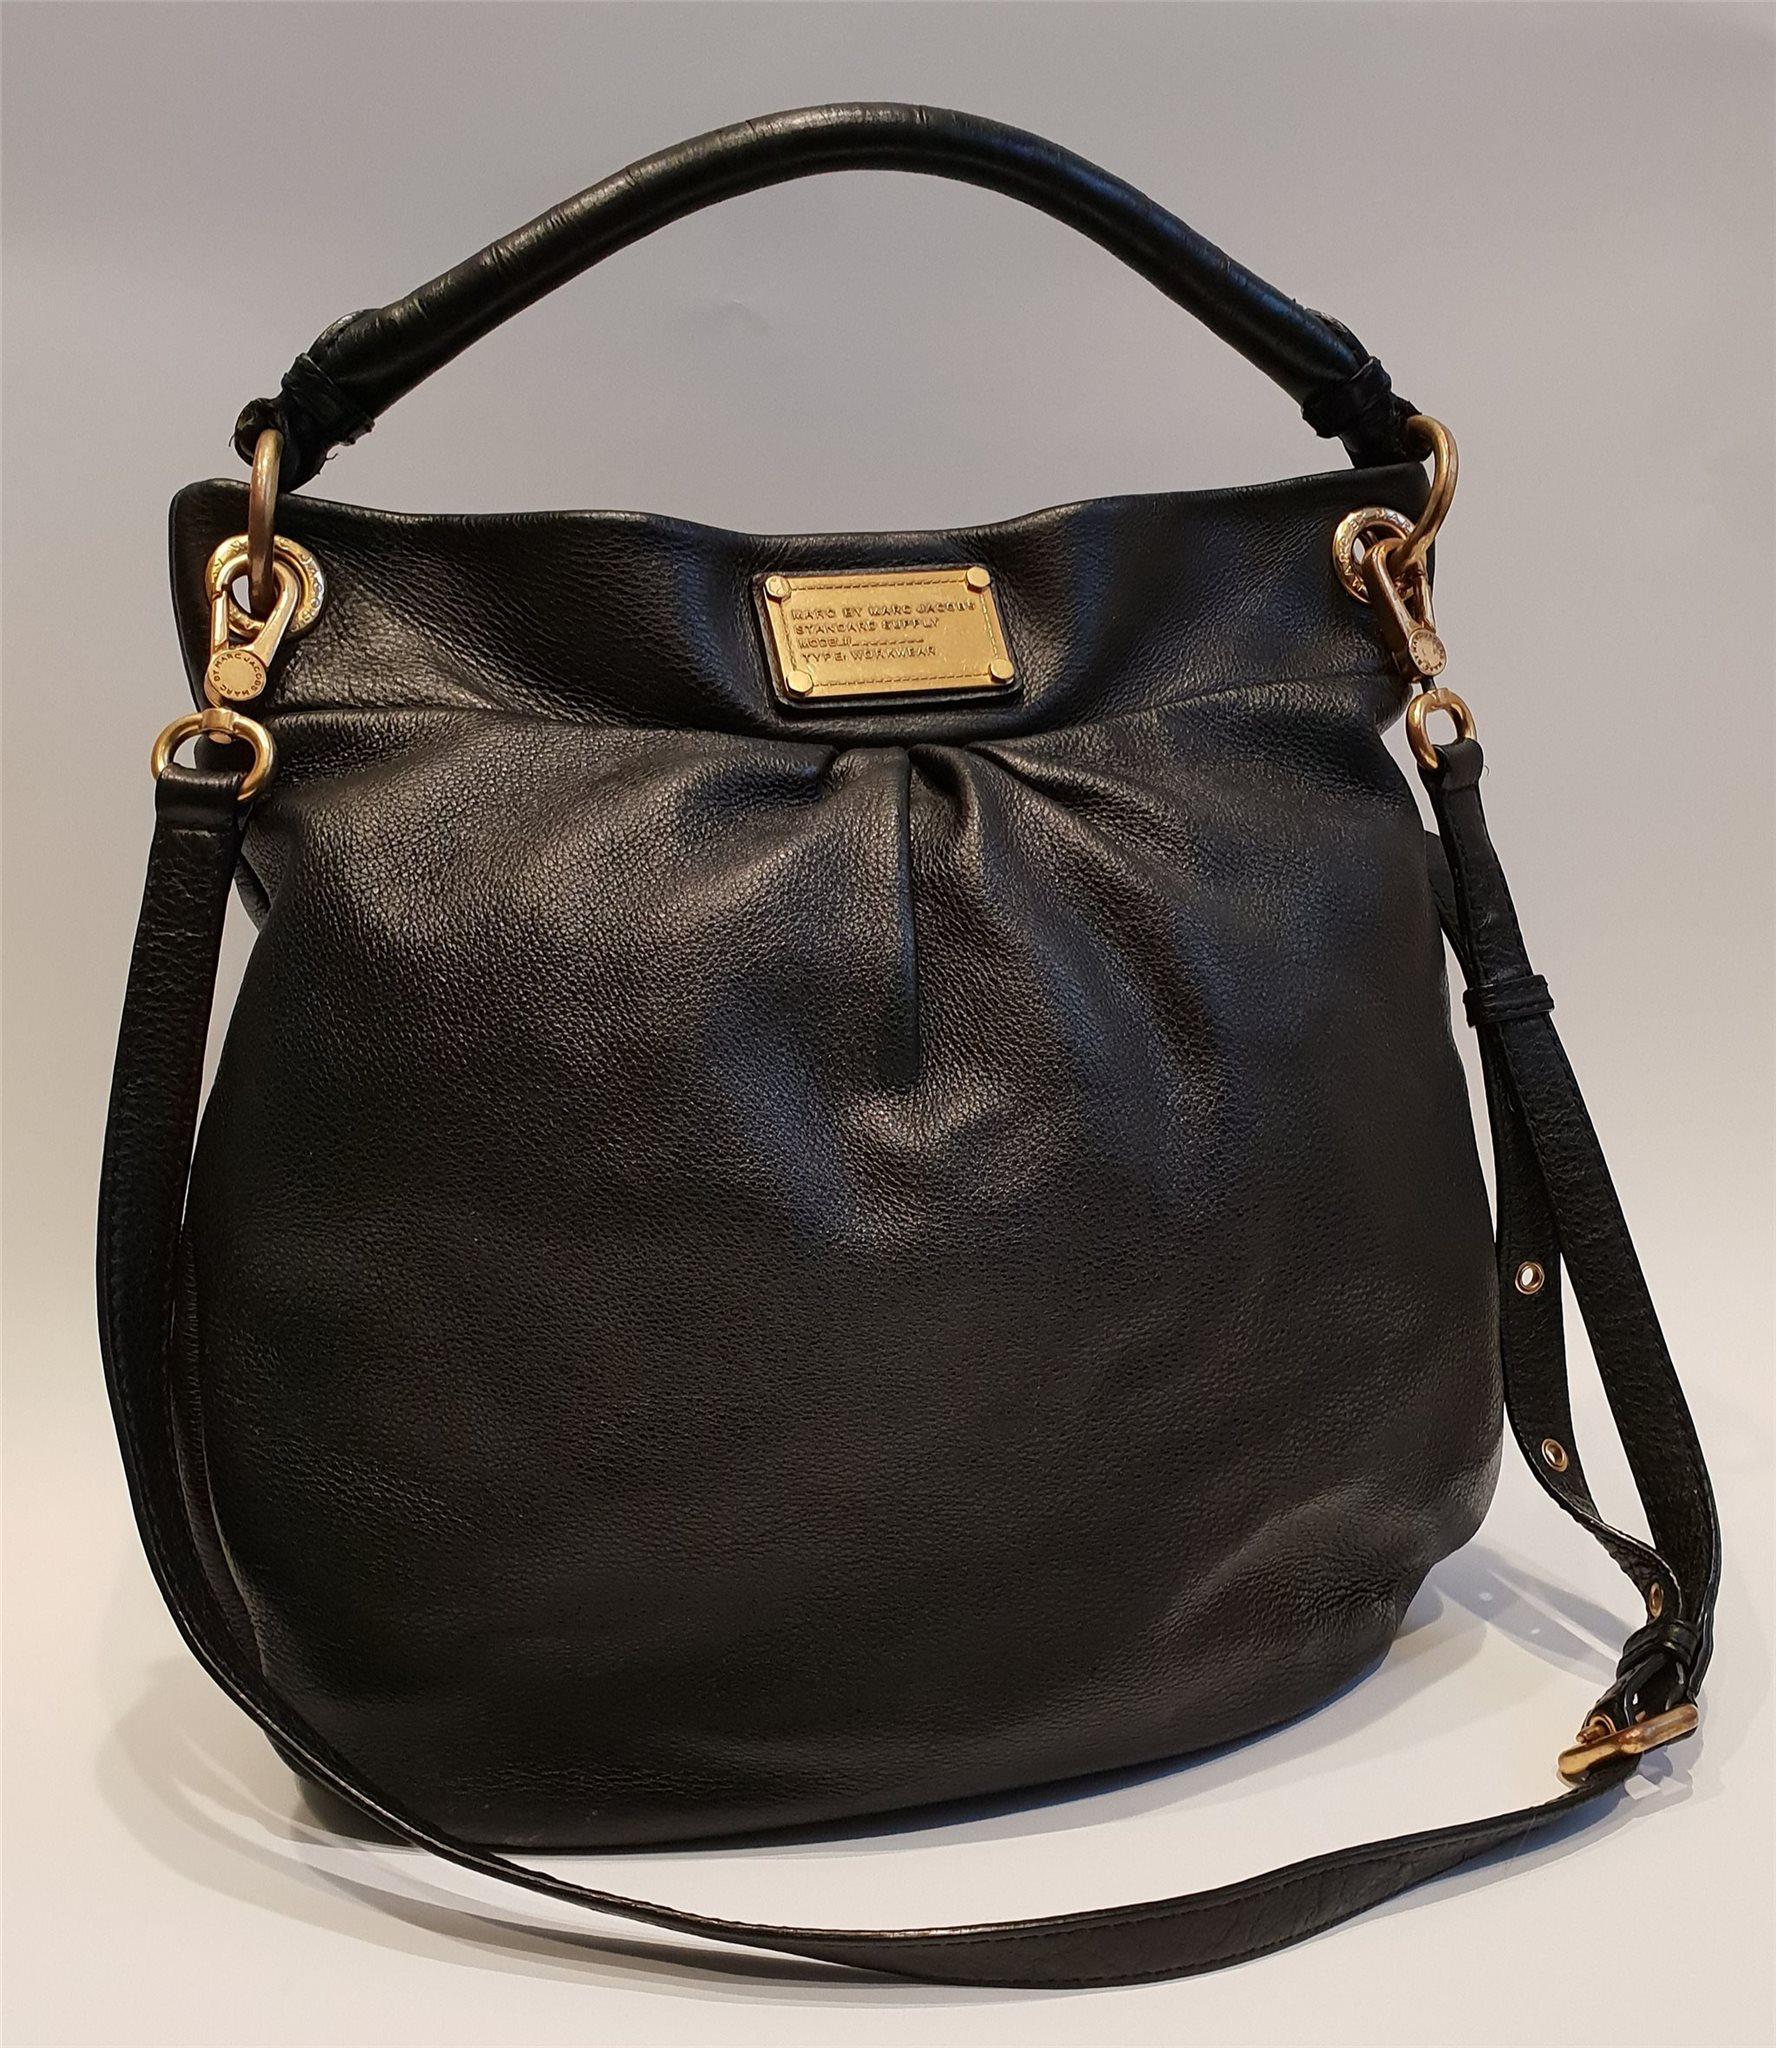 väska svart läder